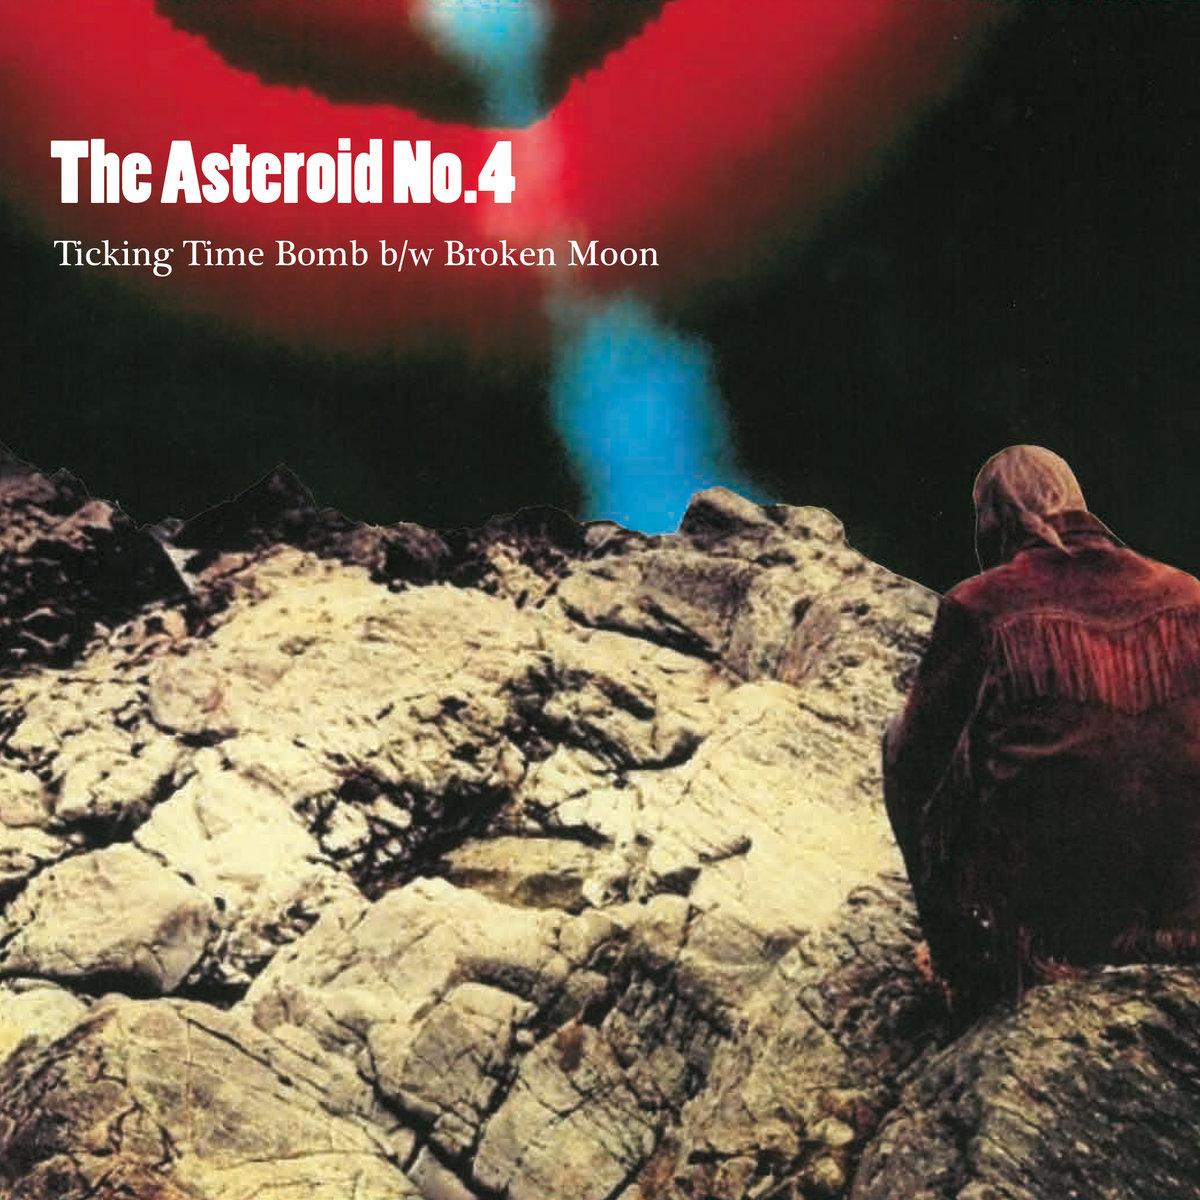 "The Asteroid No.4 'Ticking Timebomb B / W Broken Moon' 7"" vinyl (San Francisco Bay Area, 2017)"